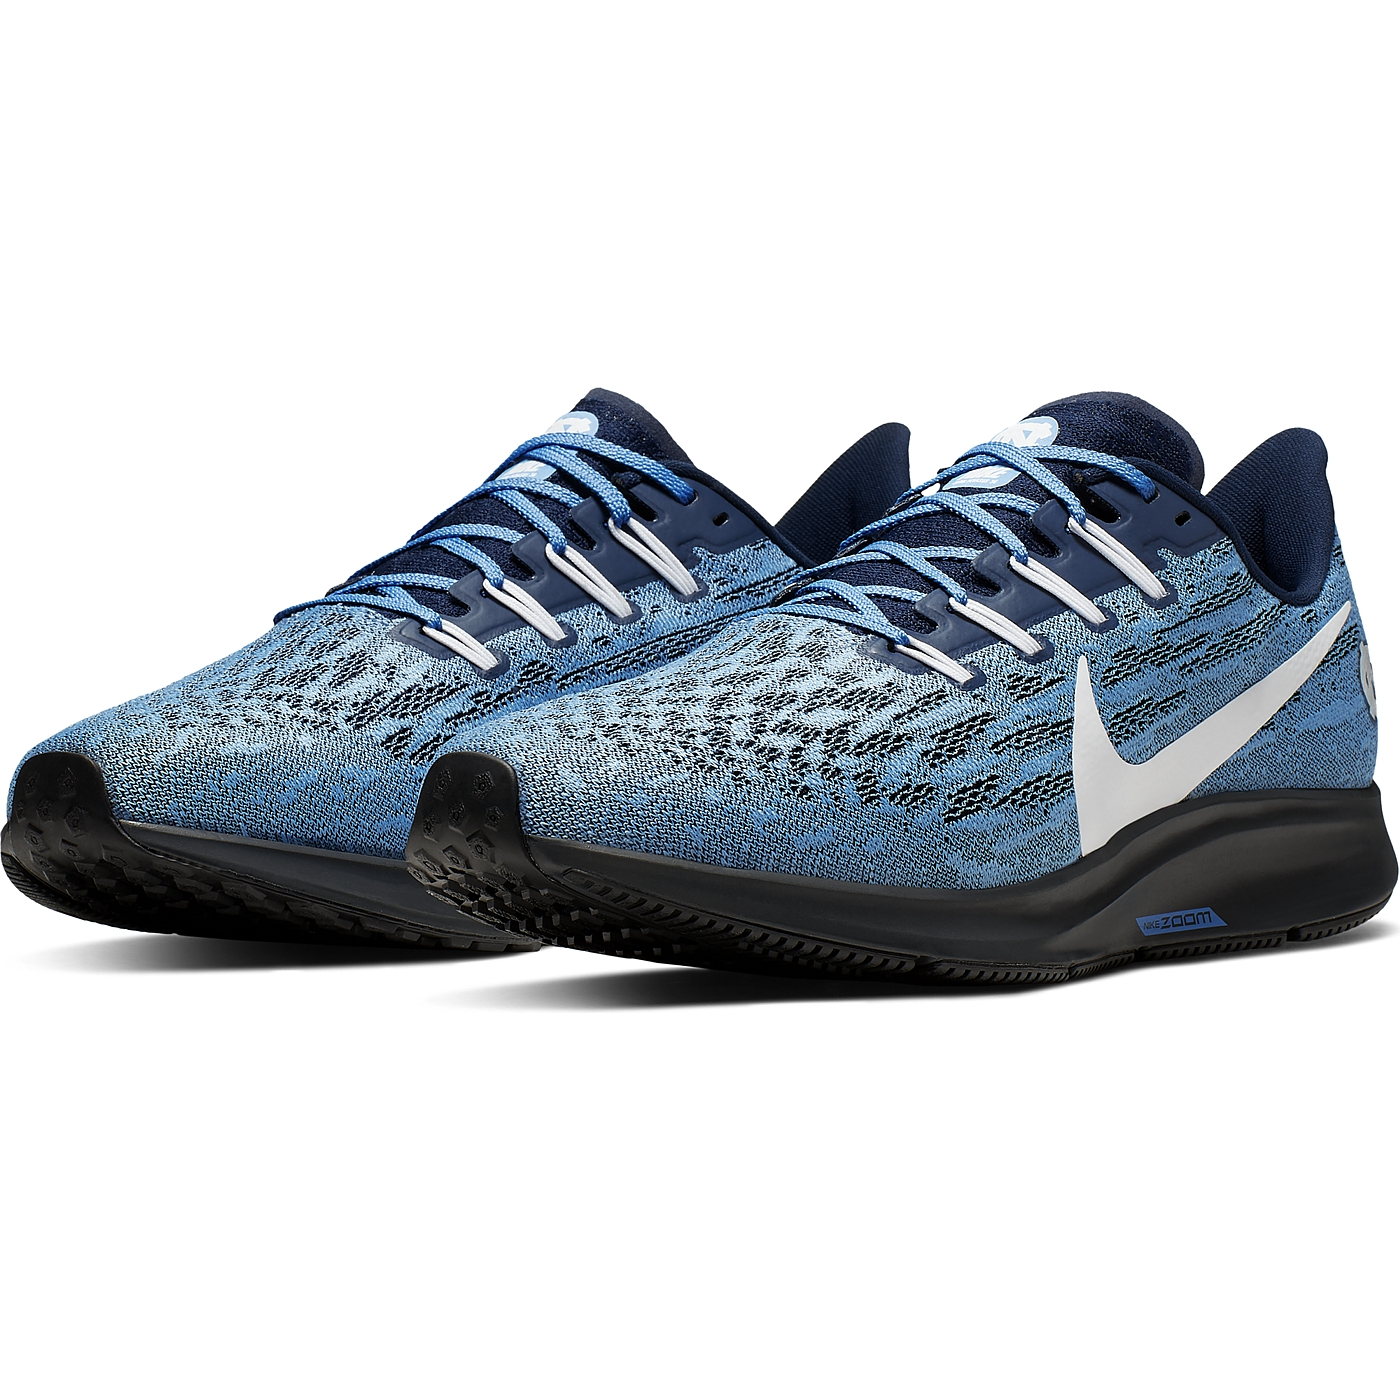 brand new e2263 d549f Nike Men's Air Zoom Pegasus 36 Running Shoes (Navy/CB) by Nike